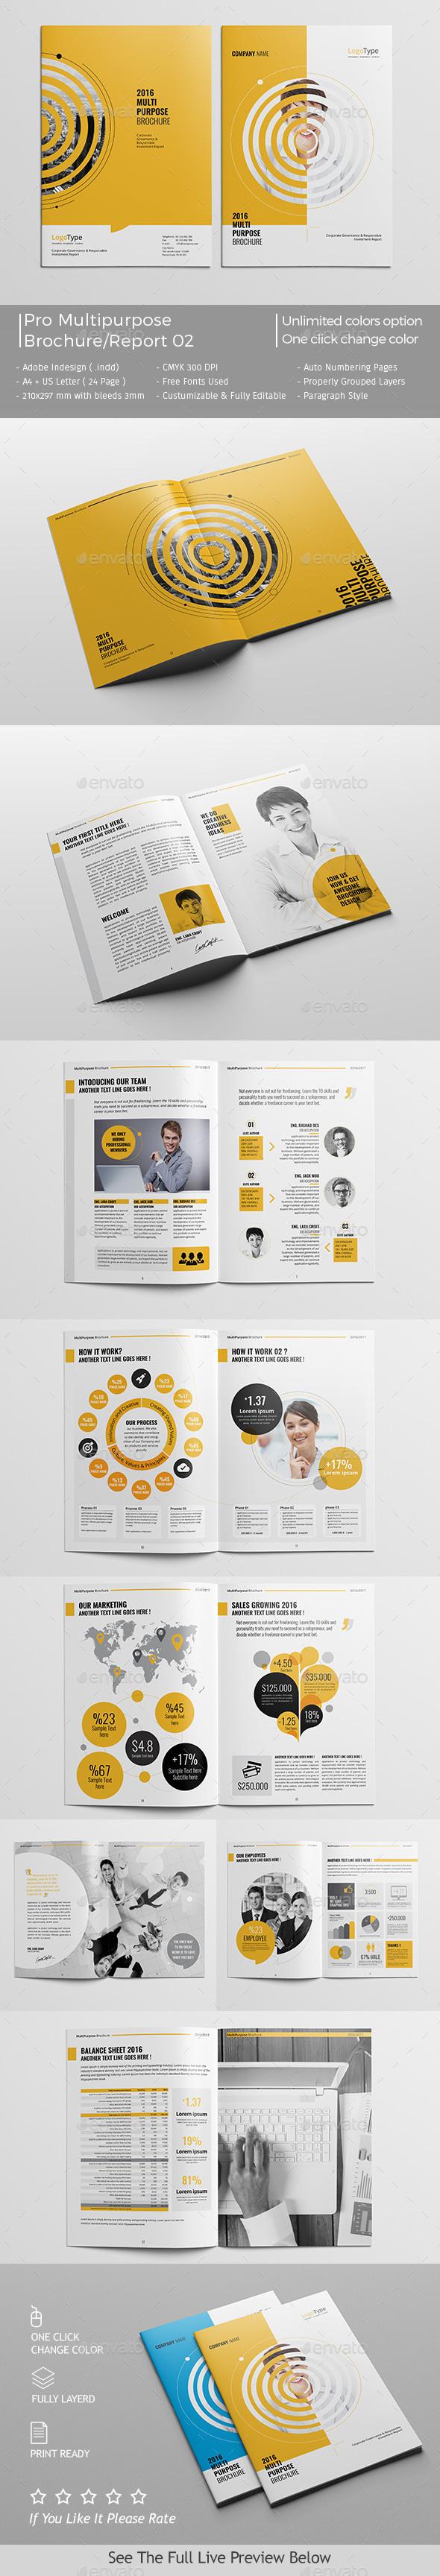 Pro Multipurpose Brochure / Report Template InDesign INDD #design ...